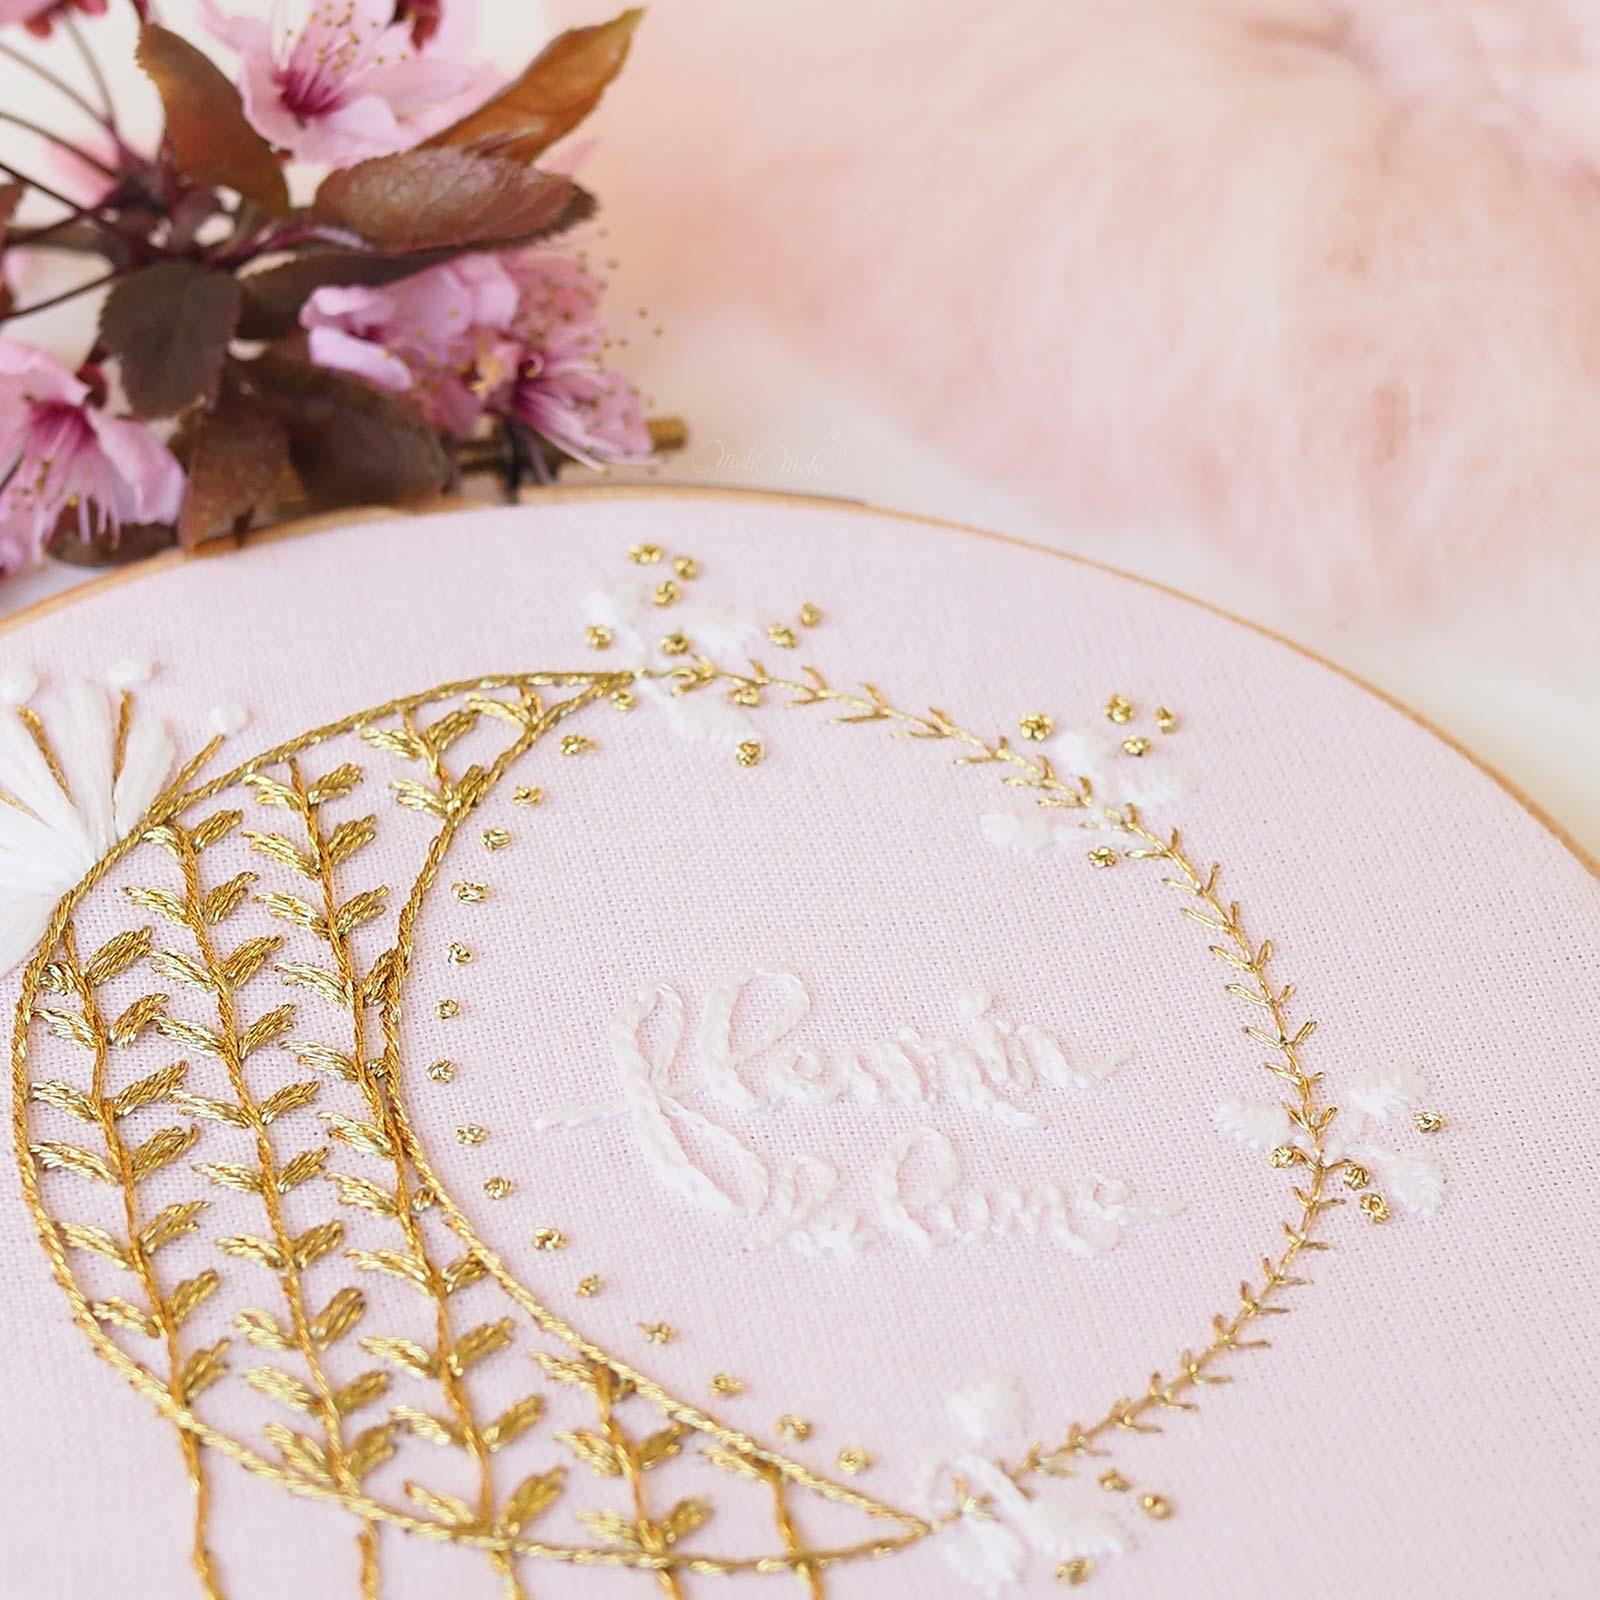 broderie fleurir lune rose blanc or dmc diamant grande Boutique MeliMelo